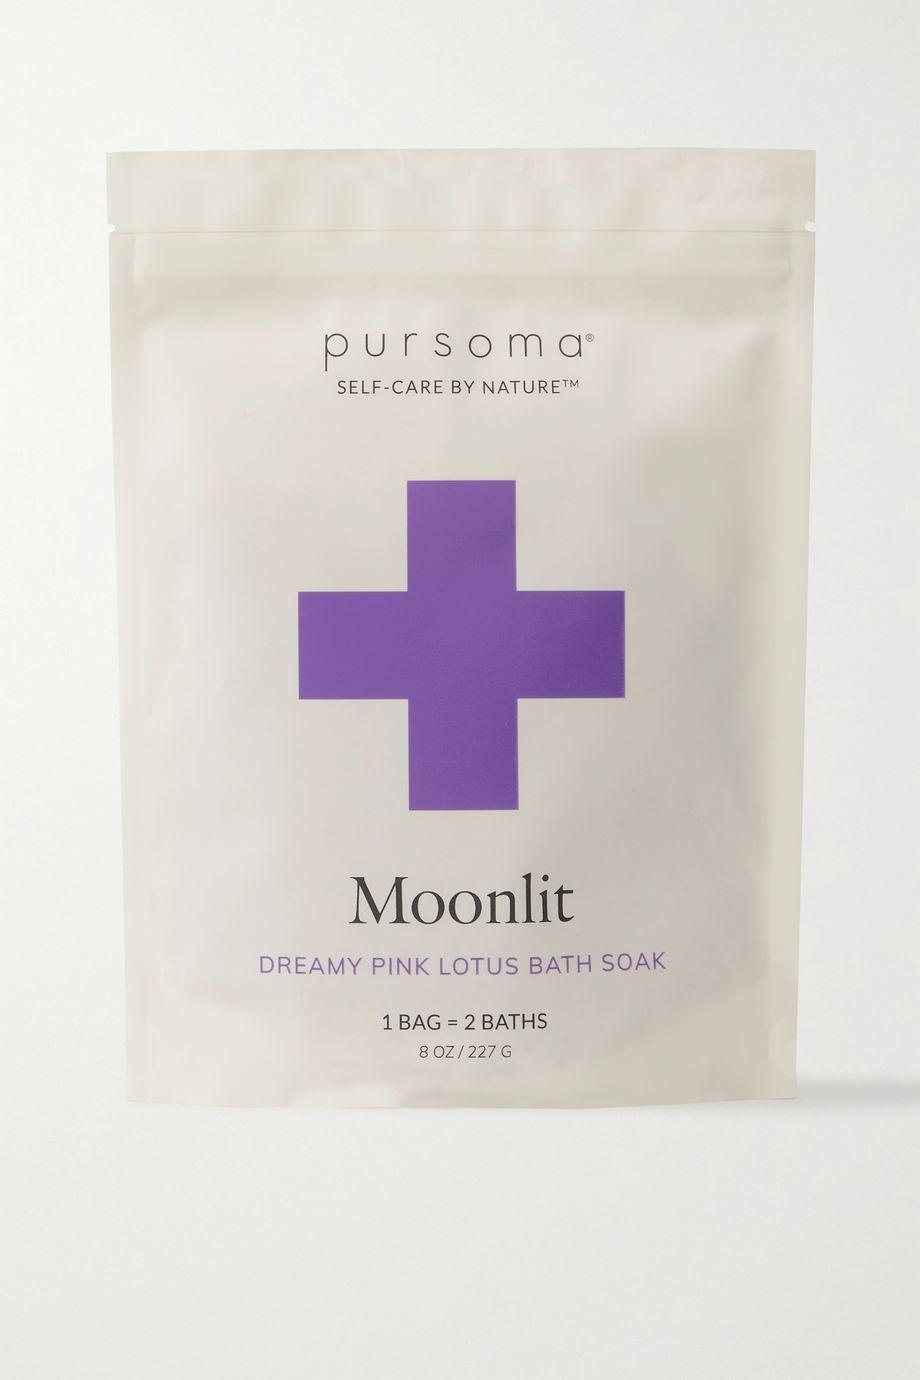 Pursoma Moonlit Ritual Bath Soak, 227g